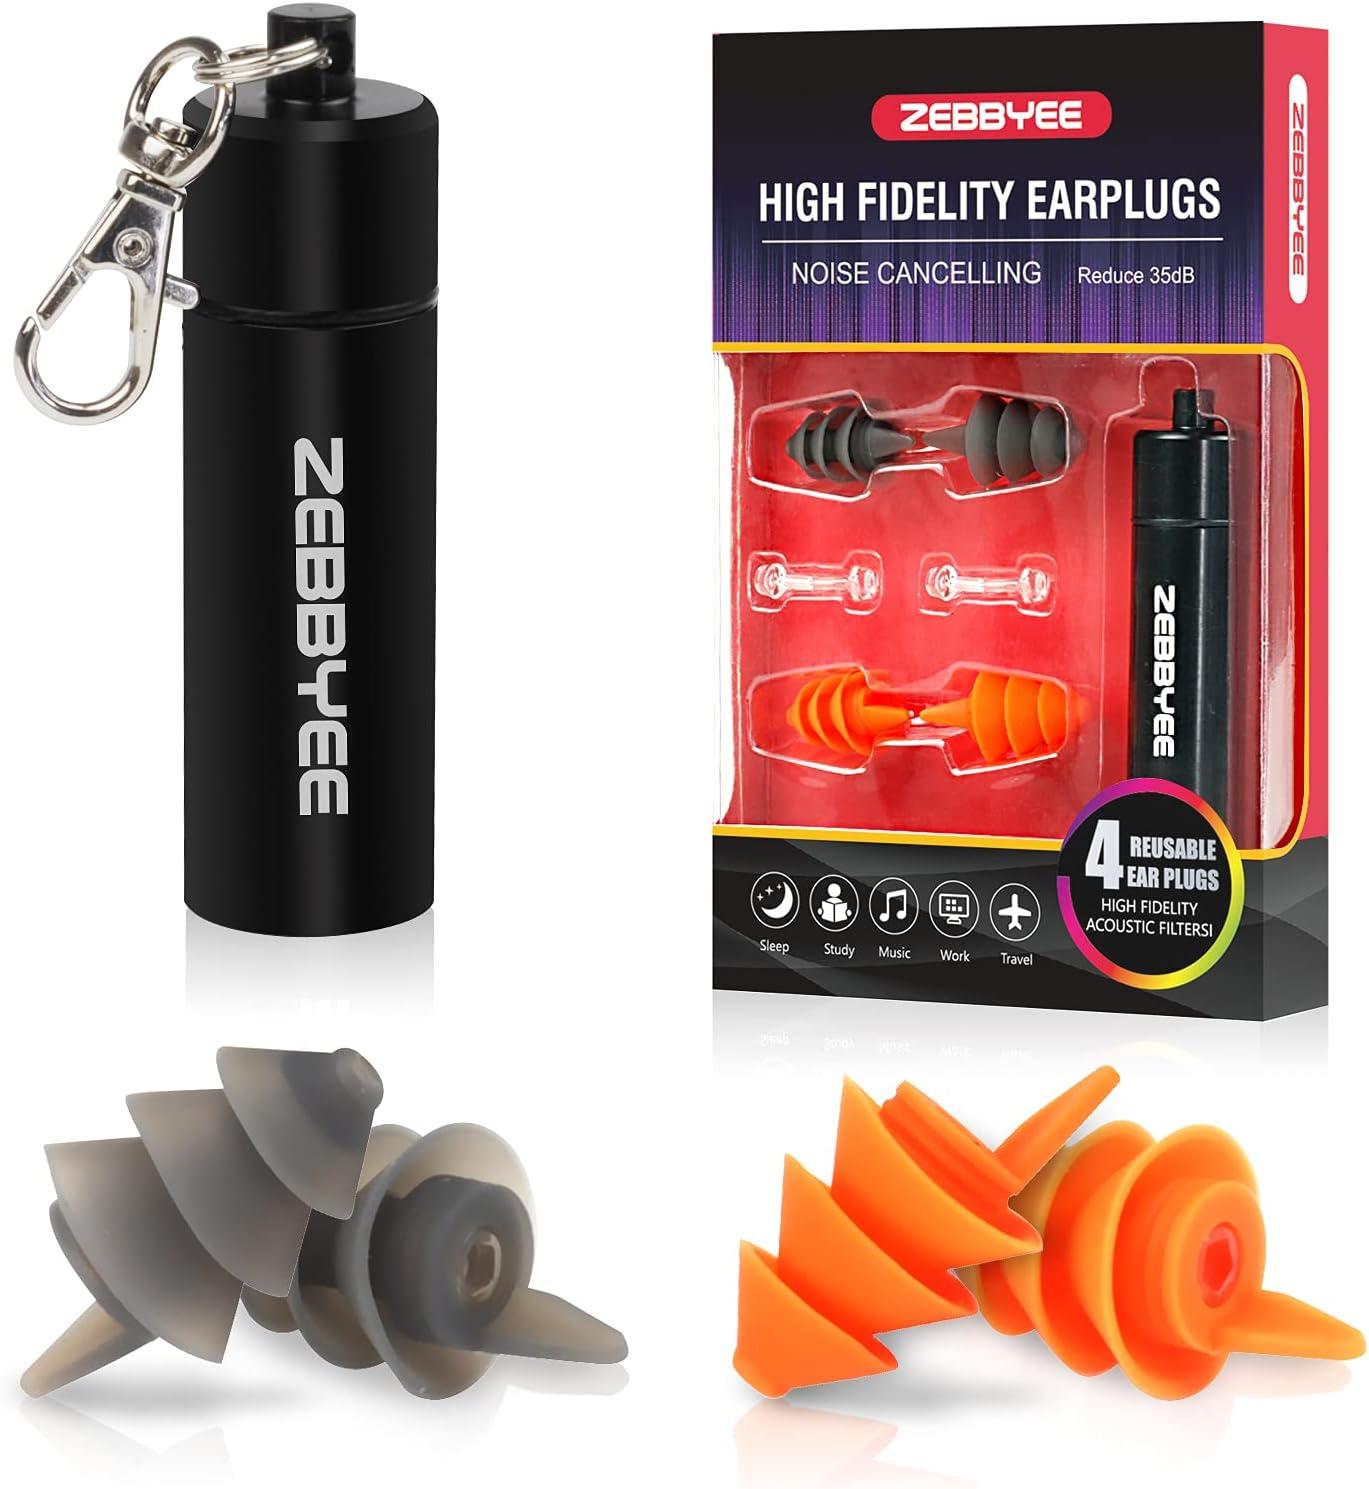 2021 spring and summer new Zebbyee half Earplugs Noise Reduction Plugs-35dB Silico Ear Reusable